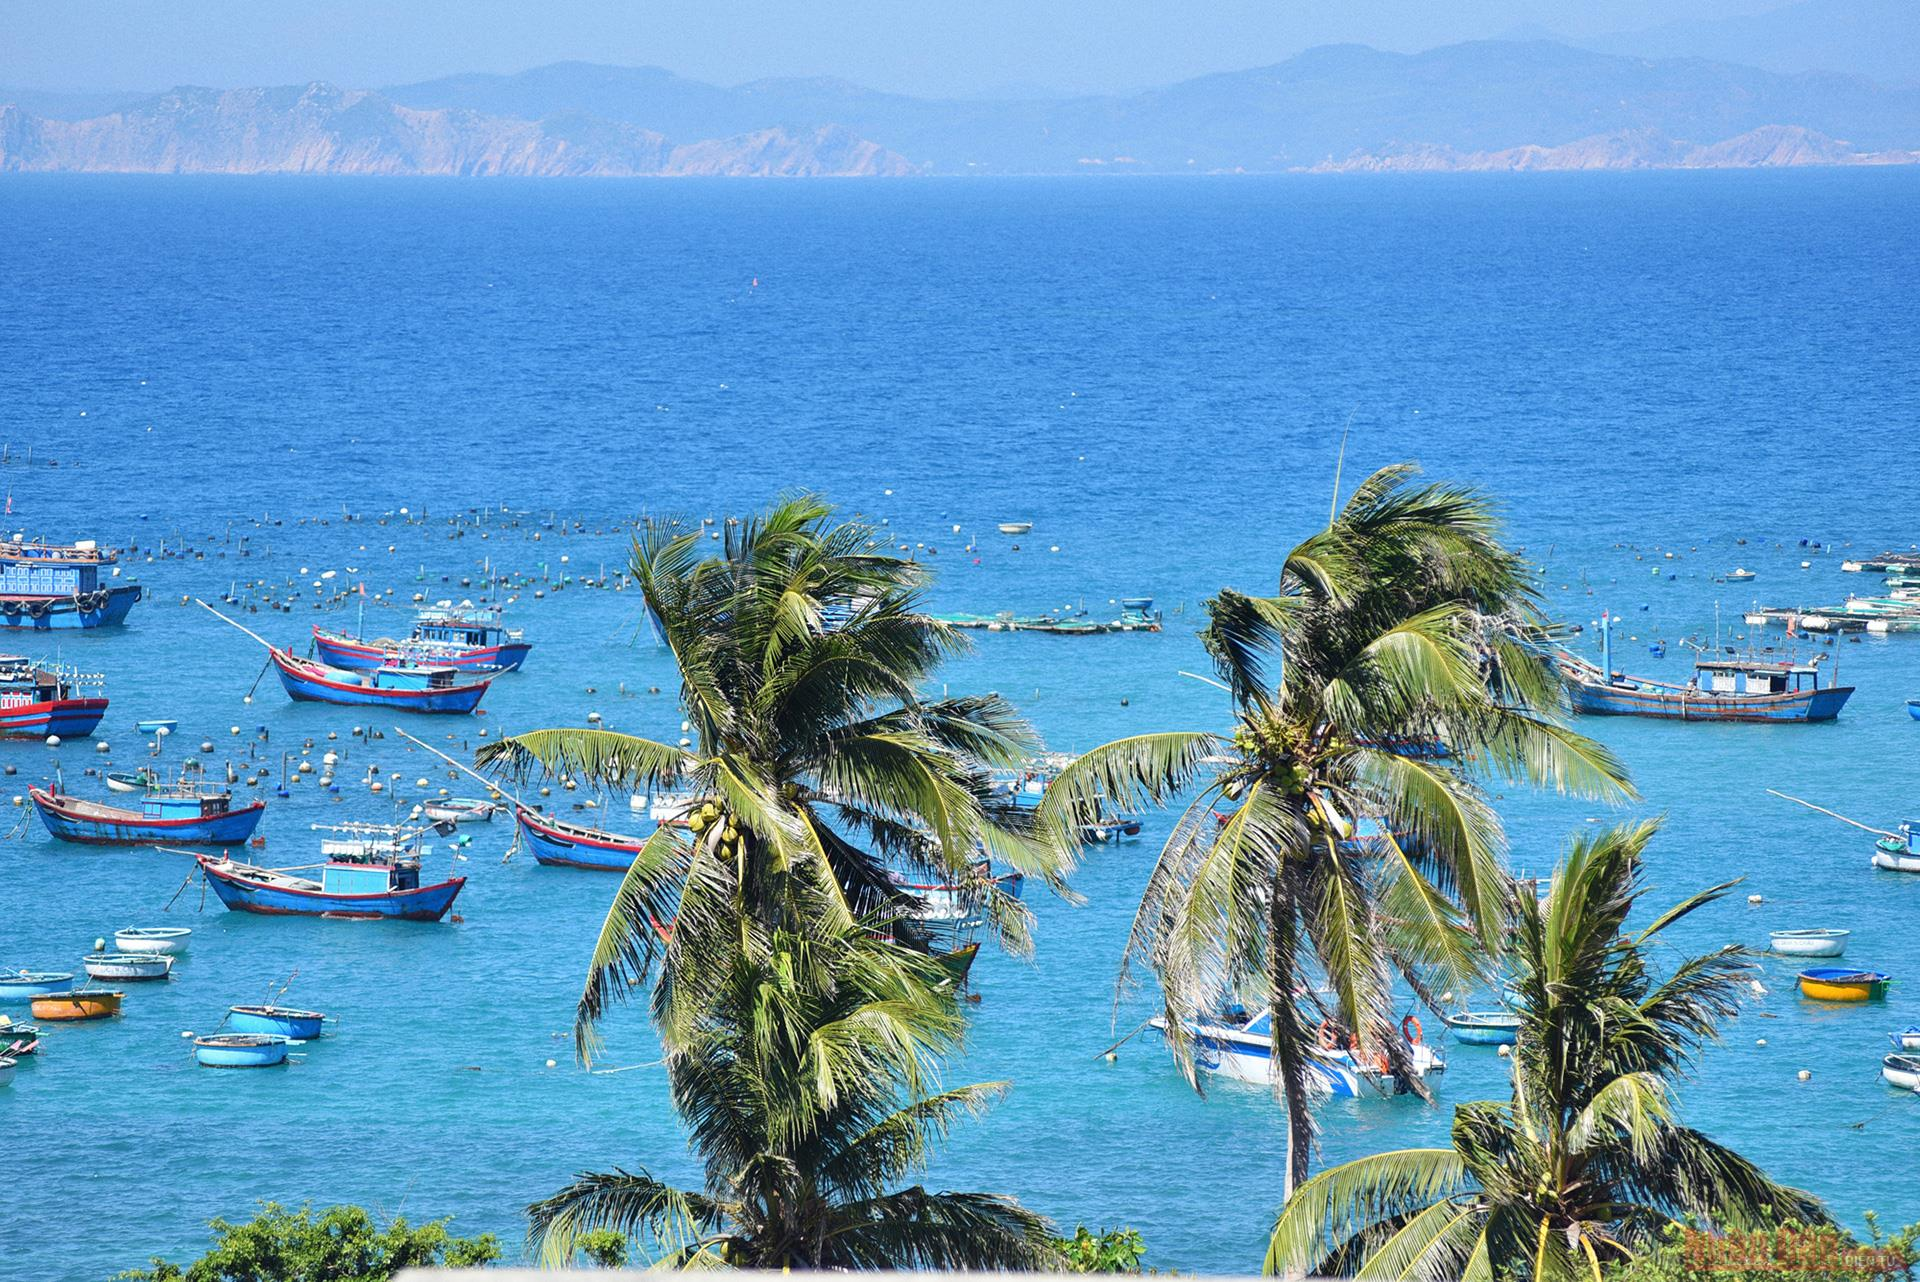 cu lao xanh a blue lagoon of vietnam